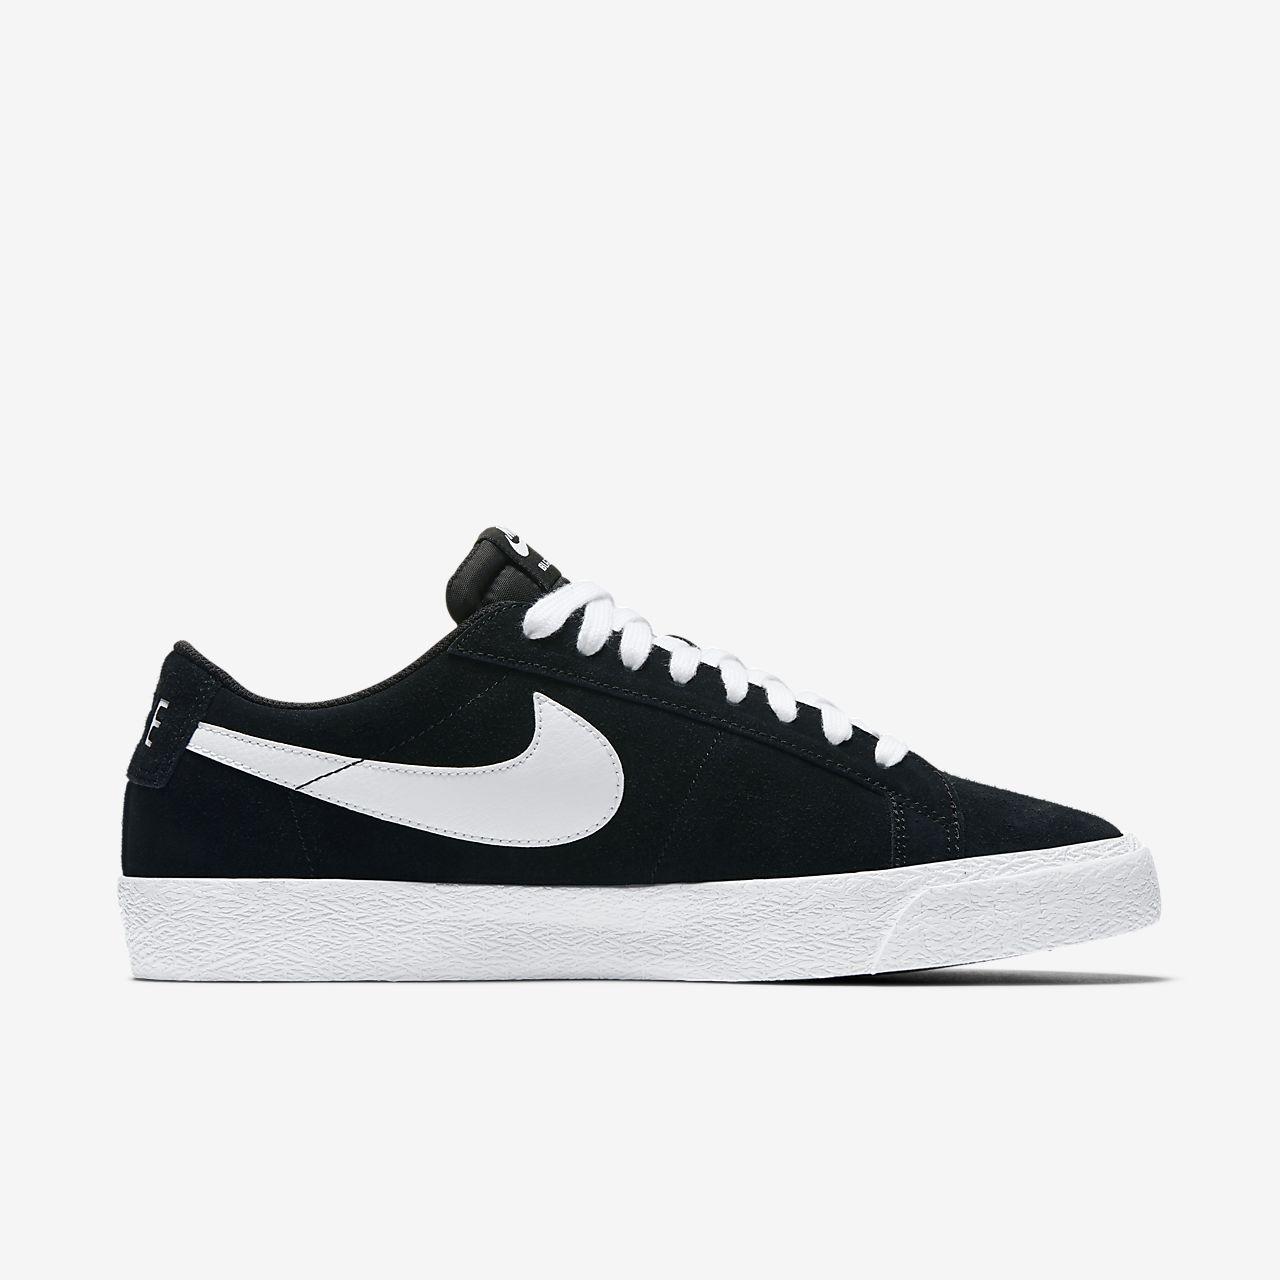 separation shoes db047 0e185 ... Nike SB Blazer Zoom Low Men s Skateboarding Shoe